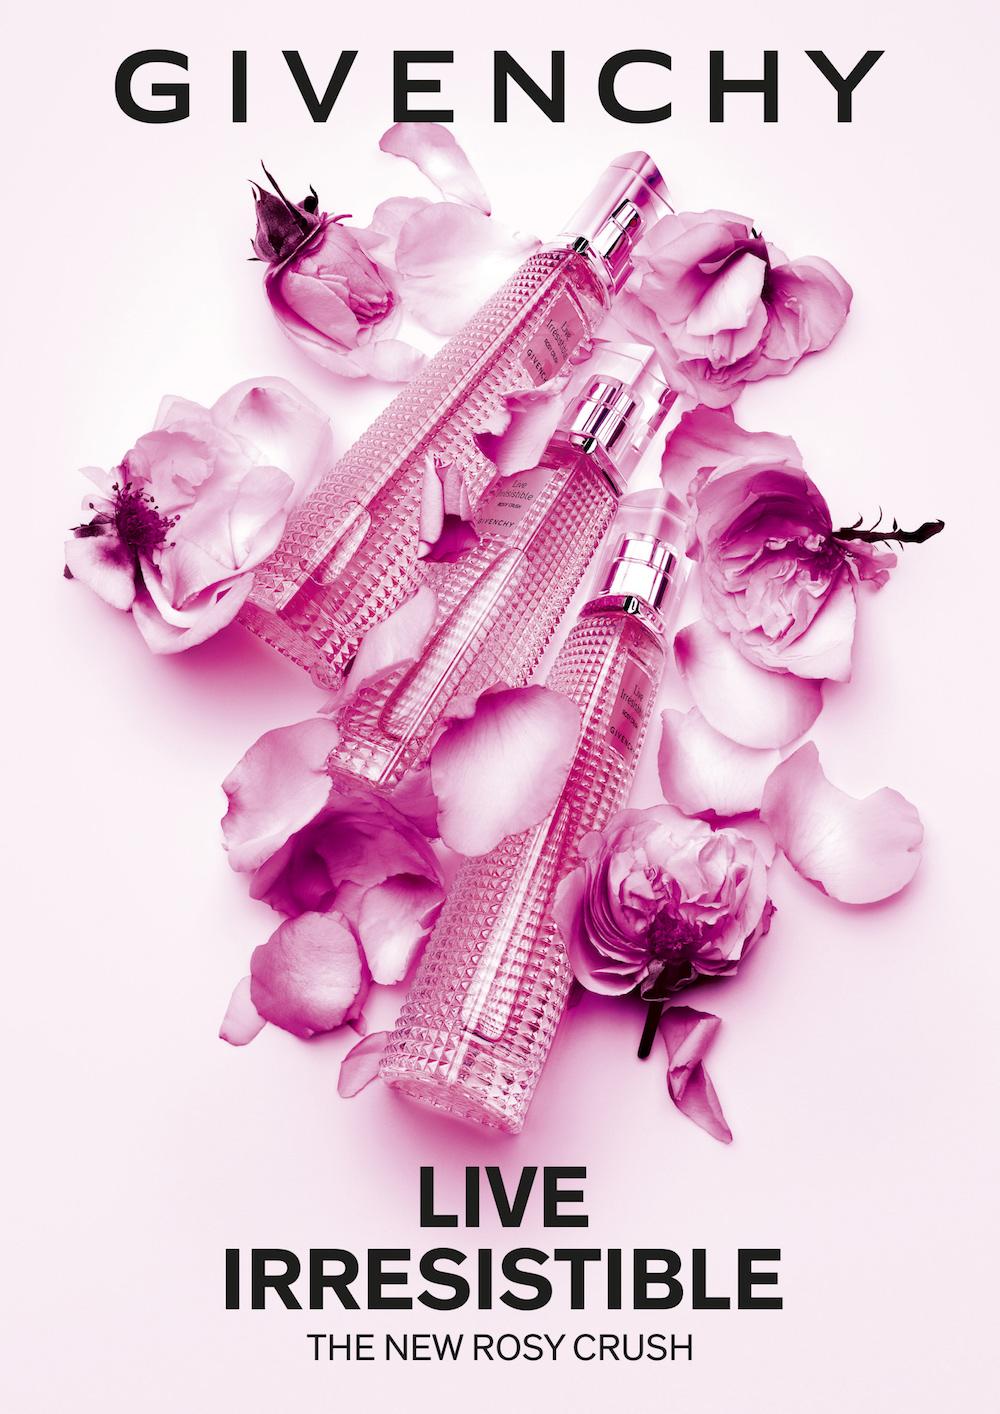 Live Irresistible Rosy Crush Eau de Parfum(リヴ イレジスティブル ロージー クラッシュ オーデパルファム)